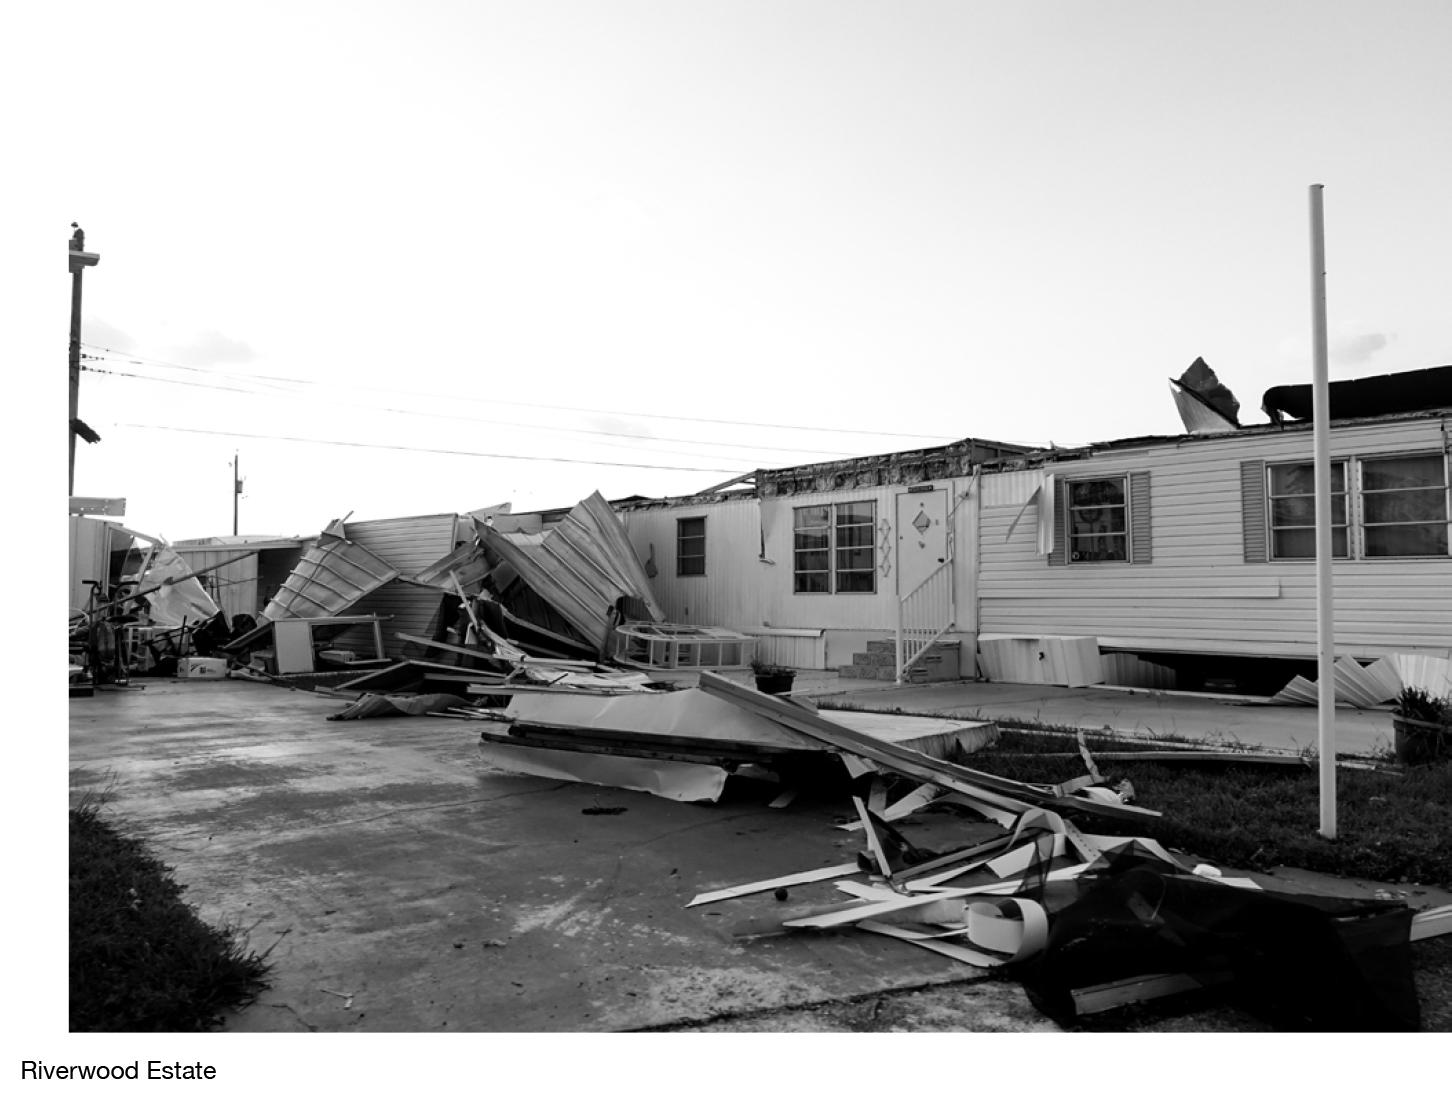 Robert LeBlanc Hurricane Irma %22Welcome To Paradise%22-17.jpg